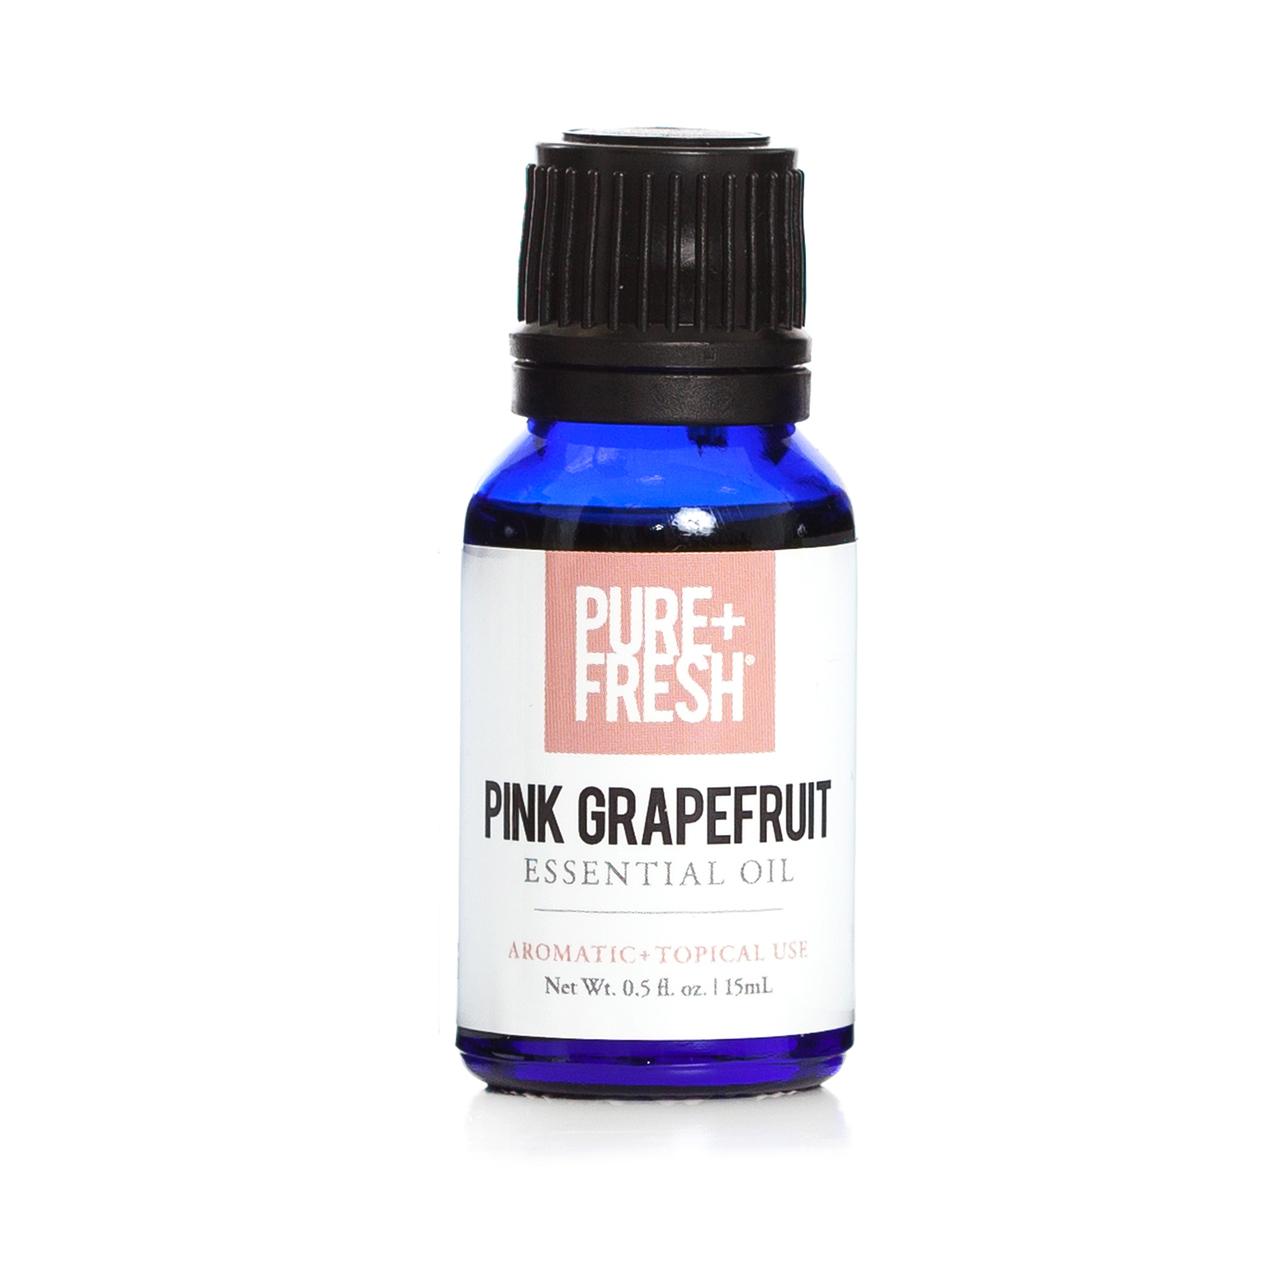 0.5fl oz. Bottle of Pure+Fresh Essential Oil